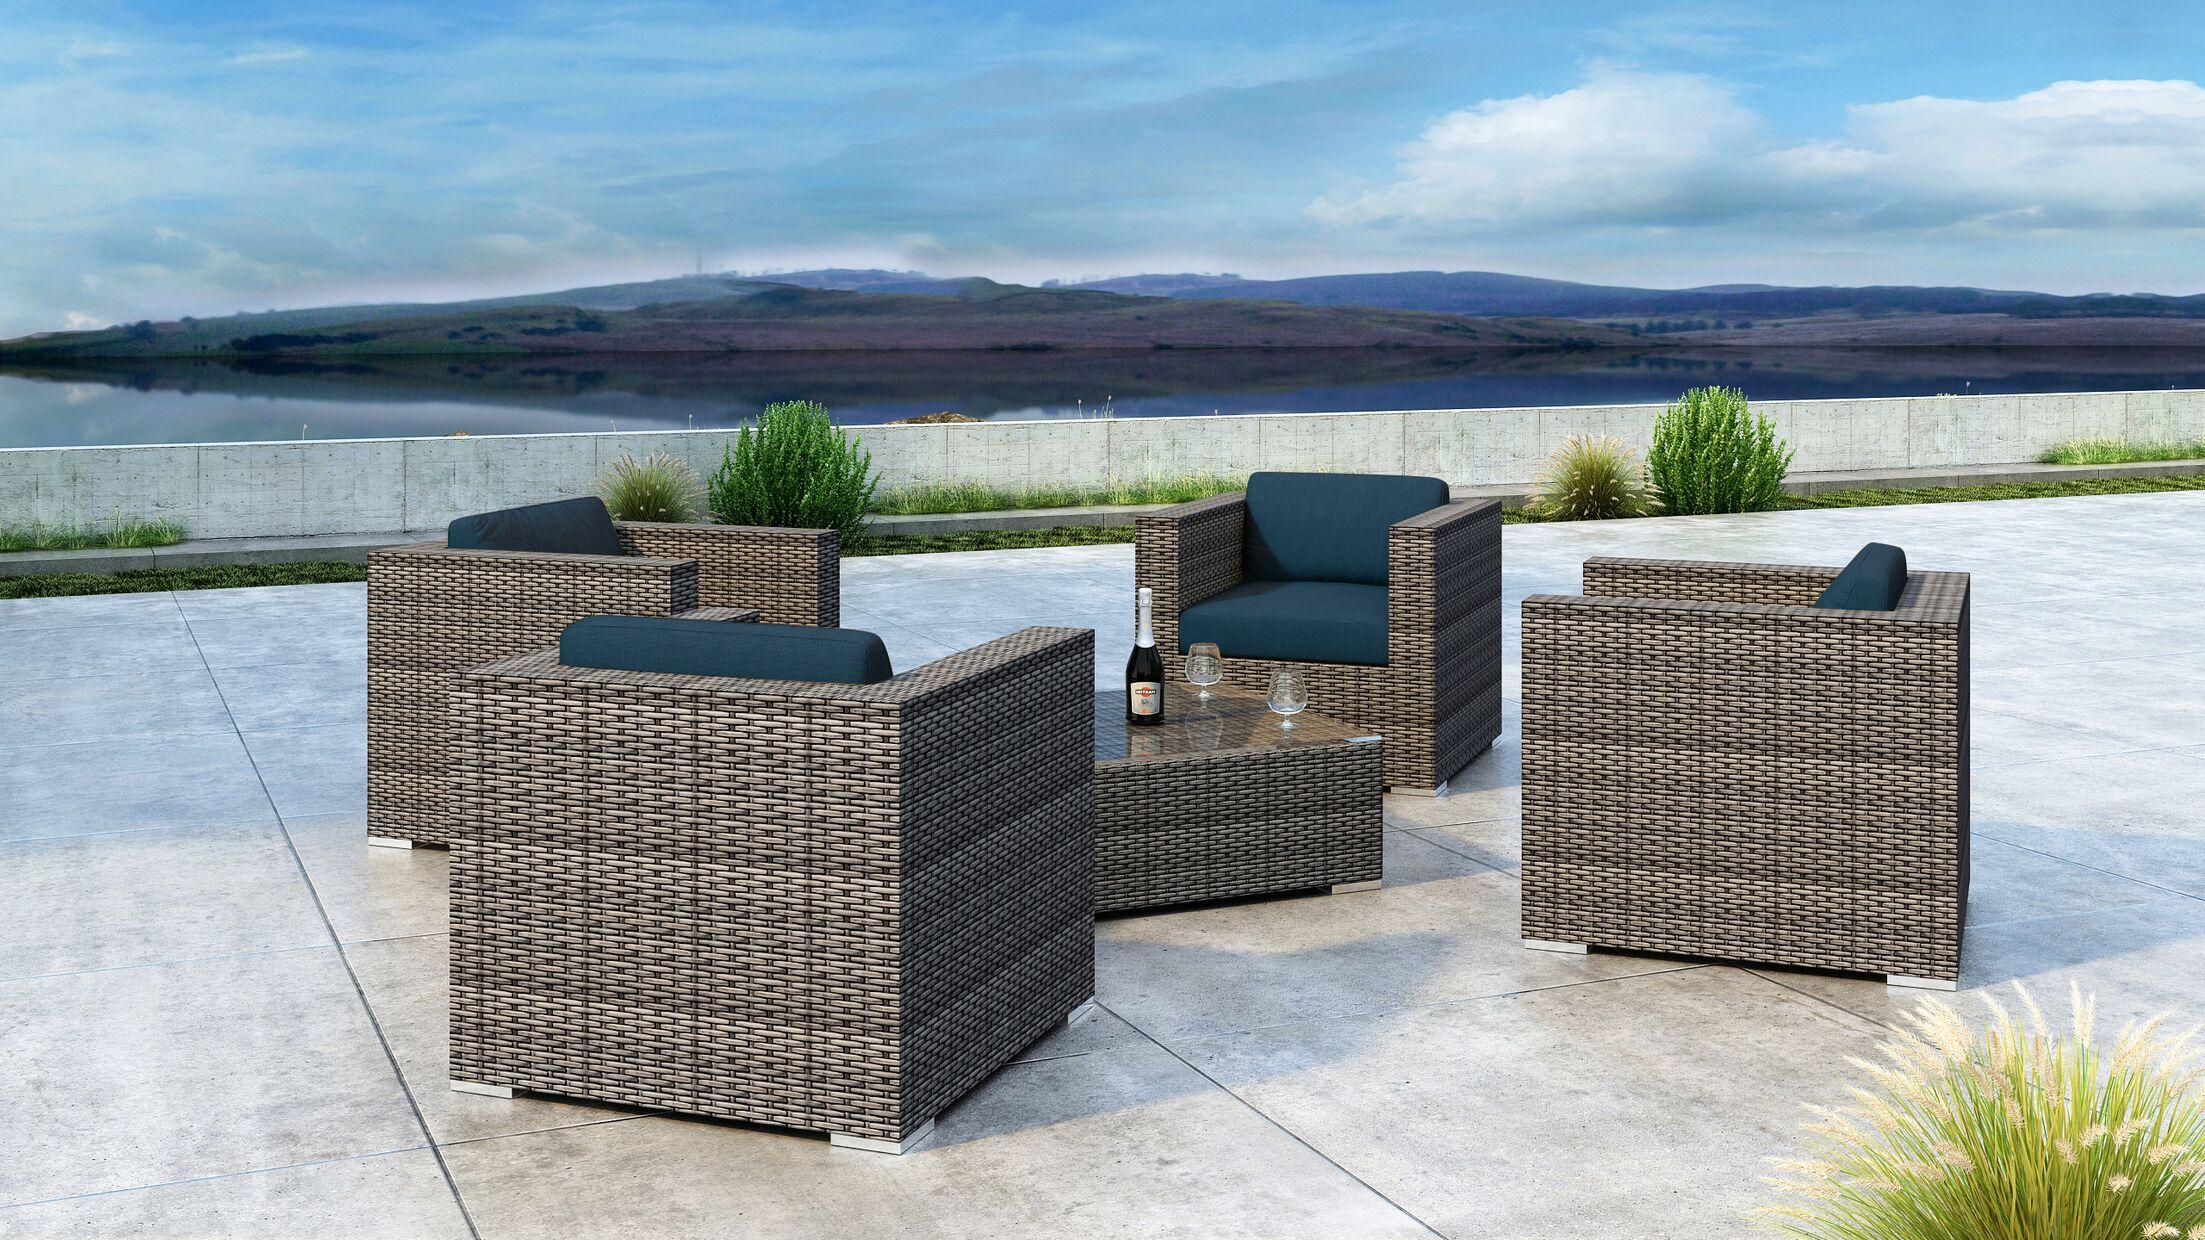 Gilleland 5 Piece Sofa Set with Sunbrella Cushion Cushion Color: Spectrum Indigo